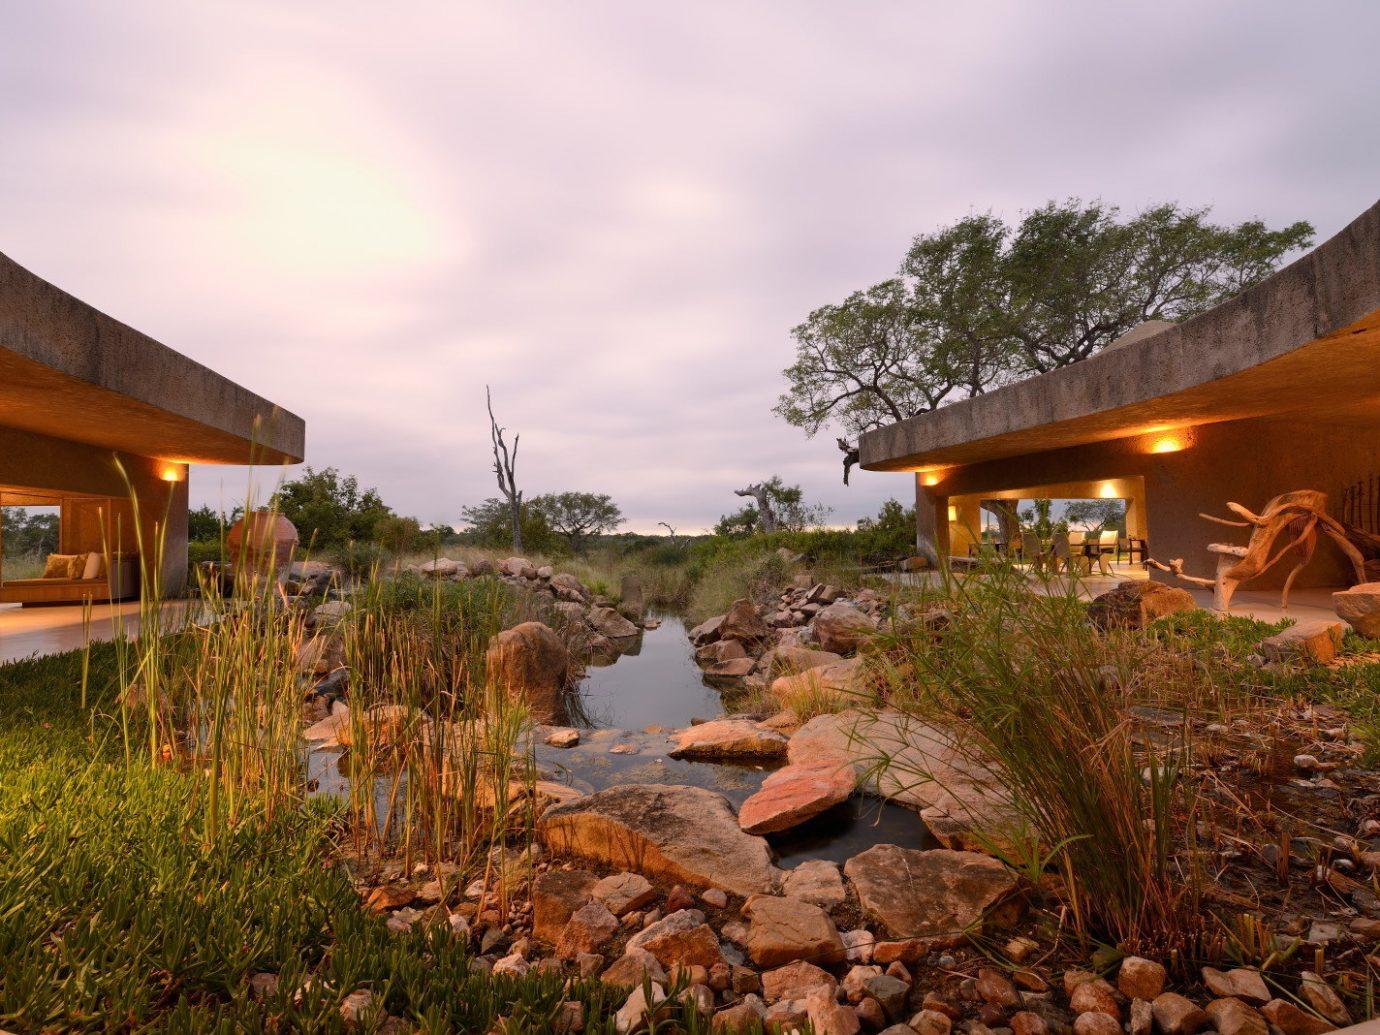 Hotels Luxury Travel outdoor sky house estate Resort home landscape Nature Village stone